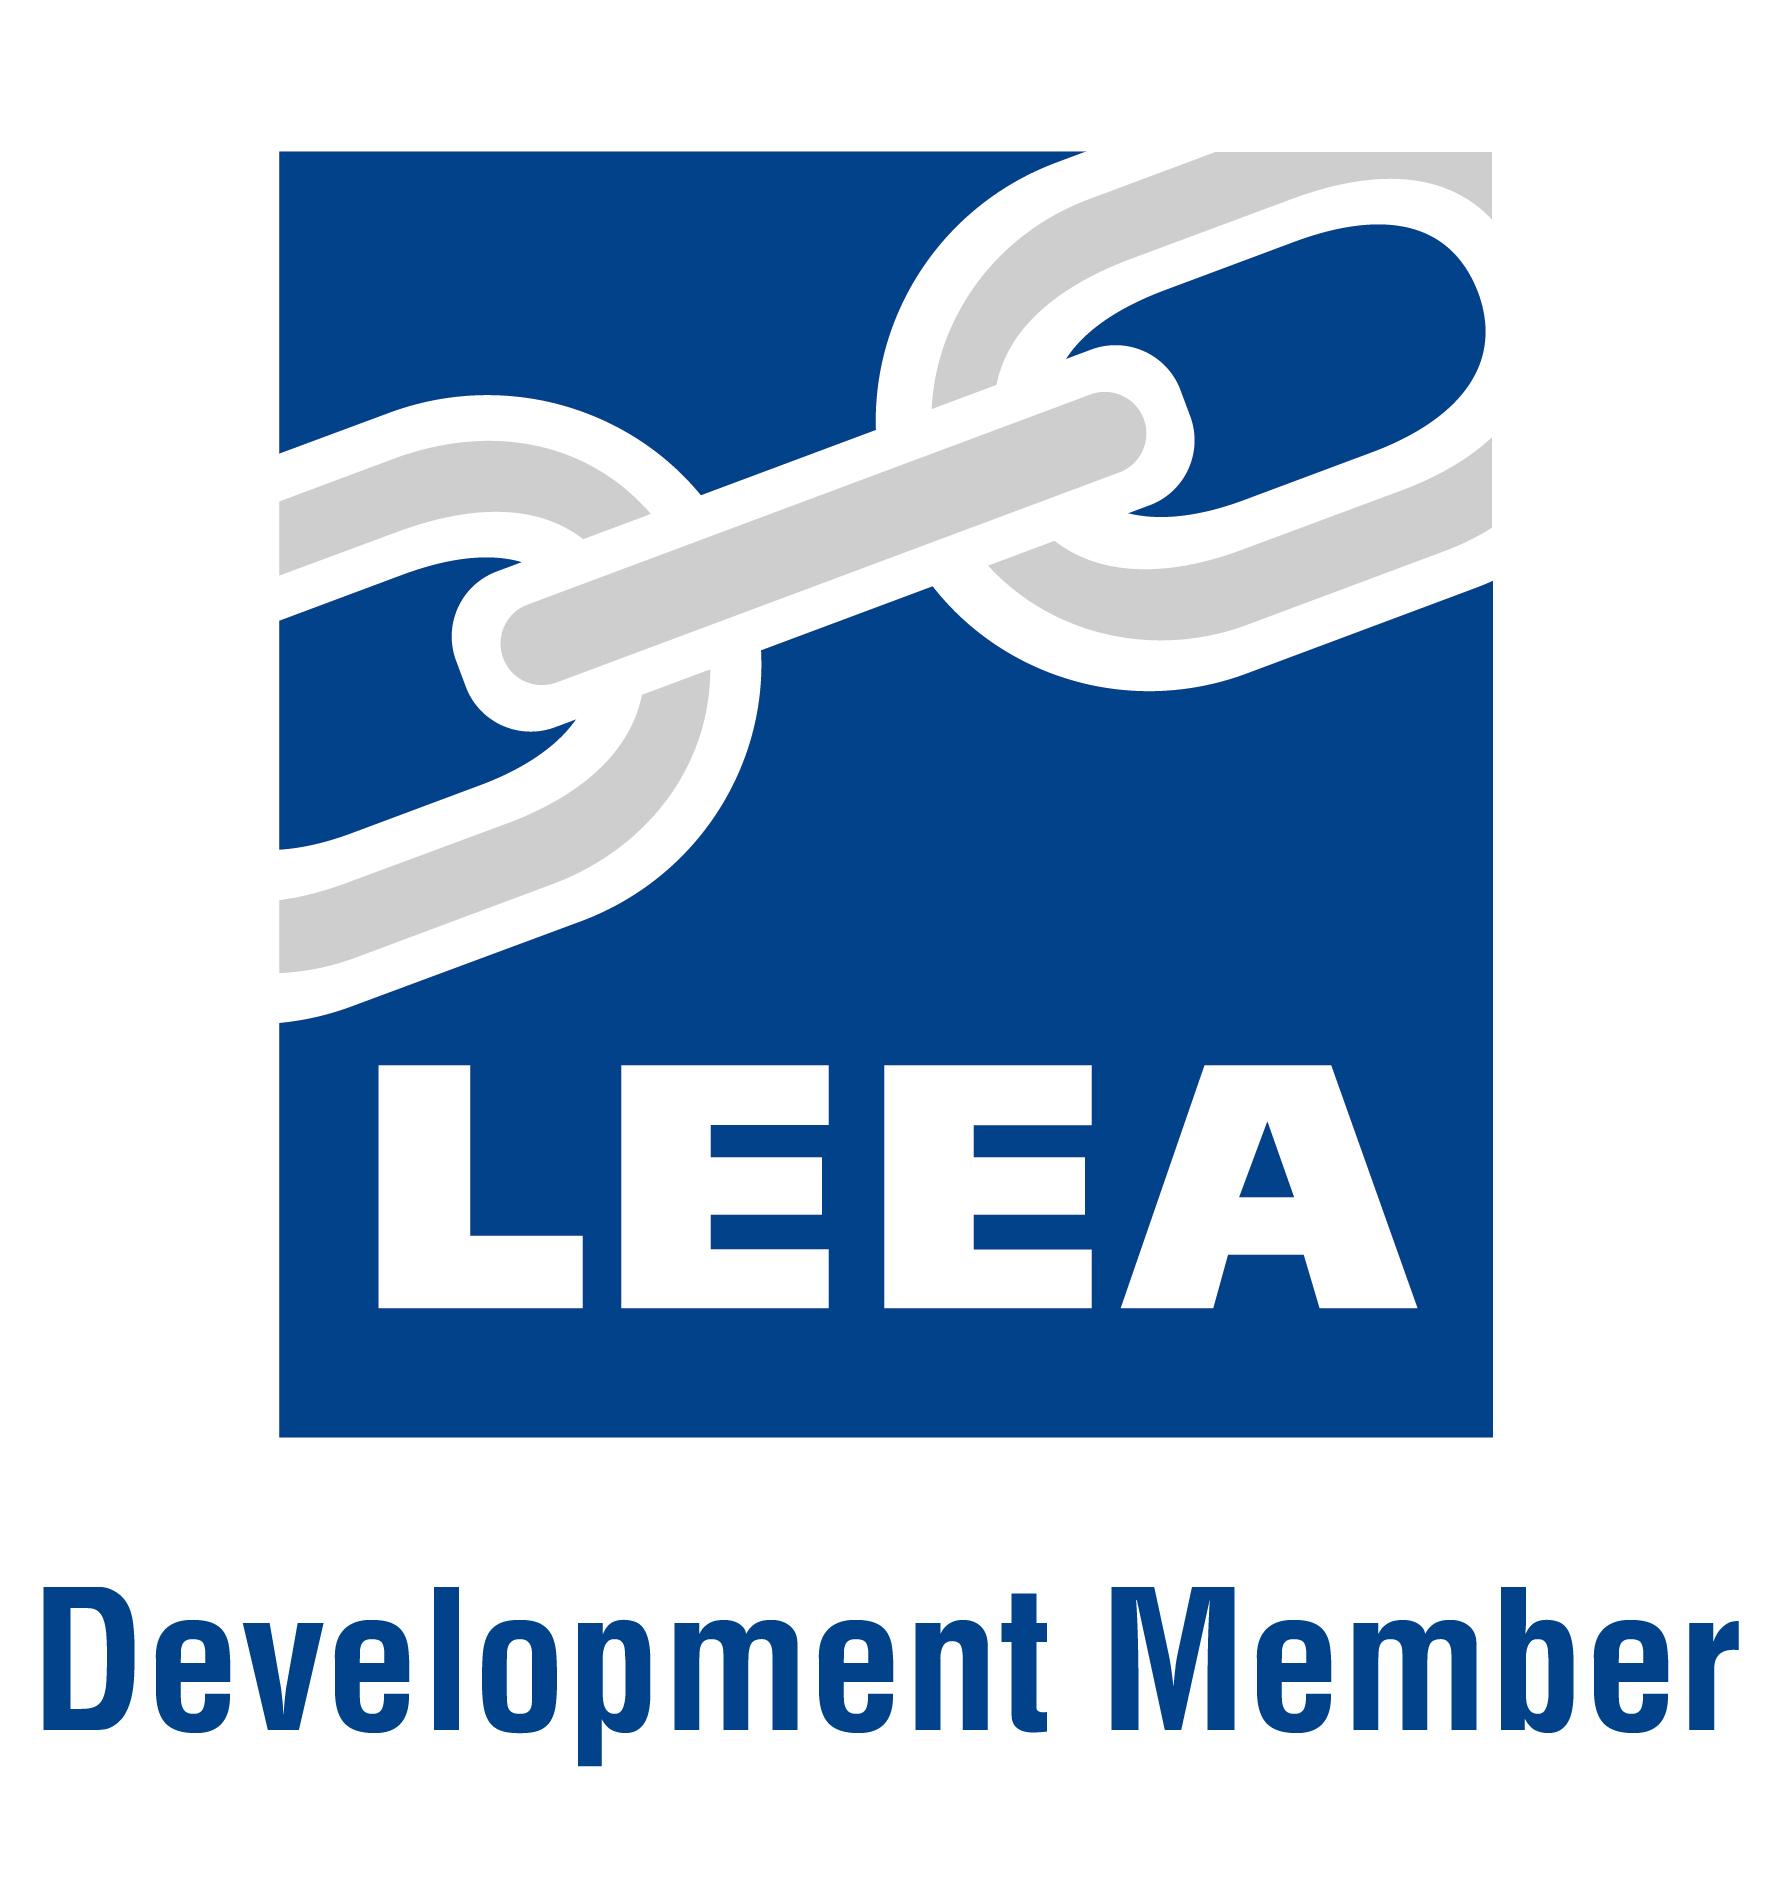 Logo_5_-_LEEA.jpg